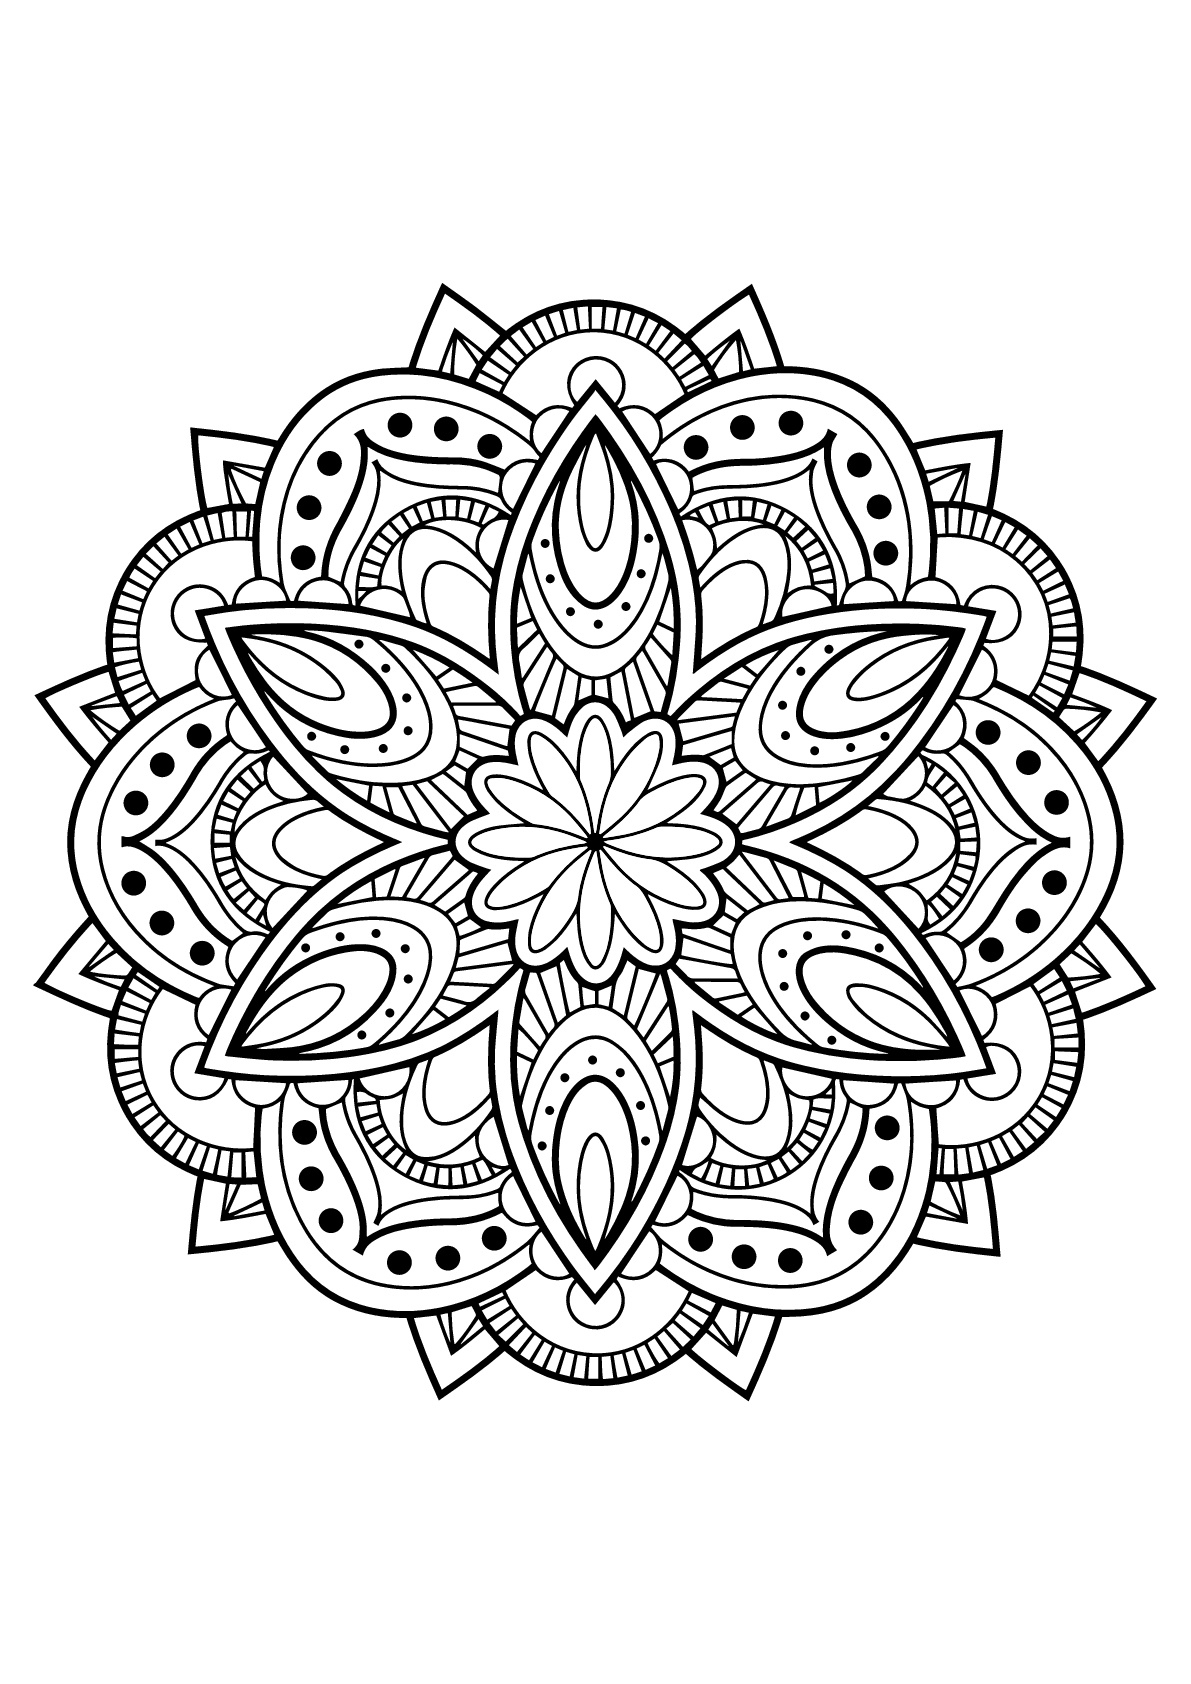 Mandala Complexe Livre Gratuit 16 - Coloriage Mandalas avec Coloriage Mandala